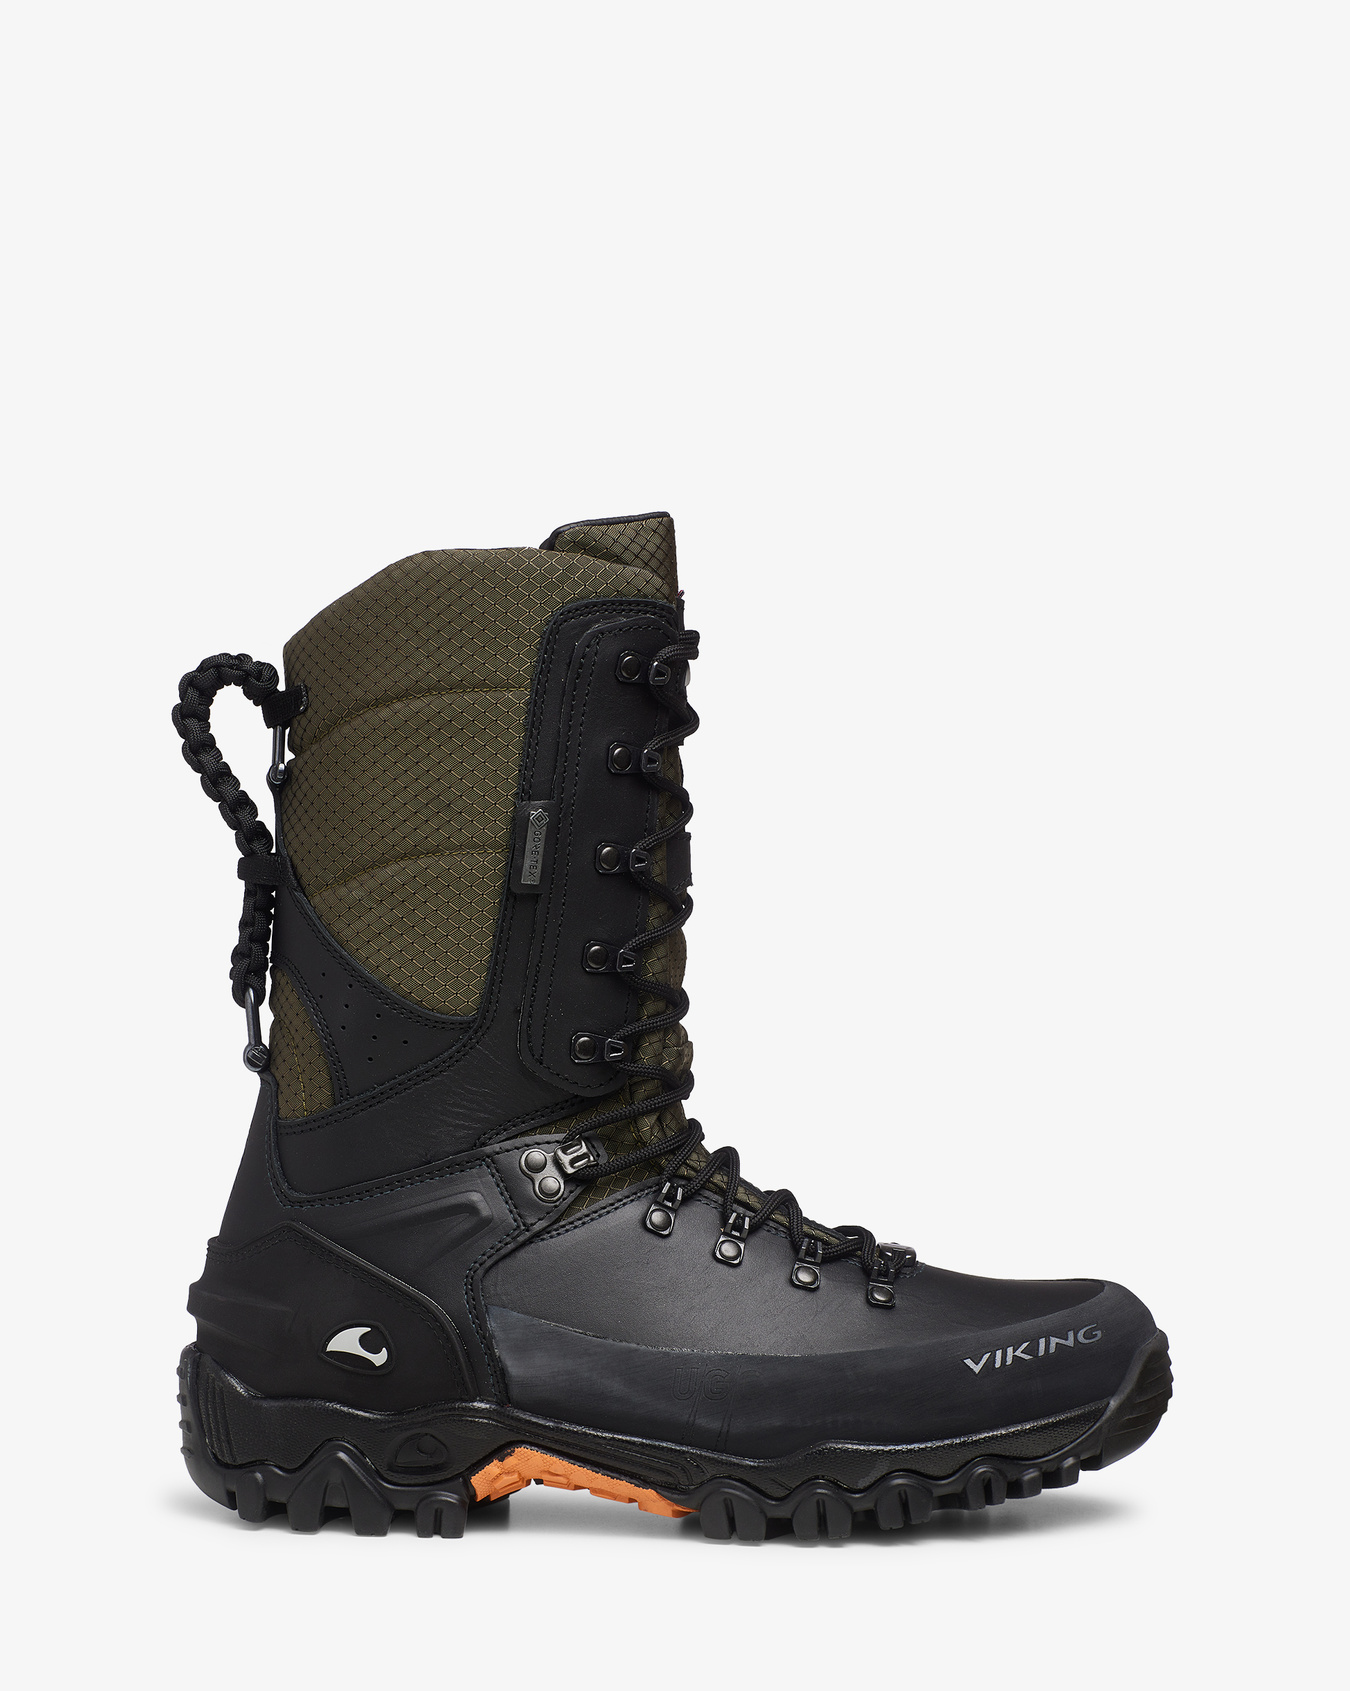 Hunter de Luxe GTX Hunting Boot